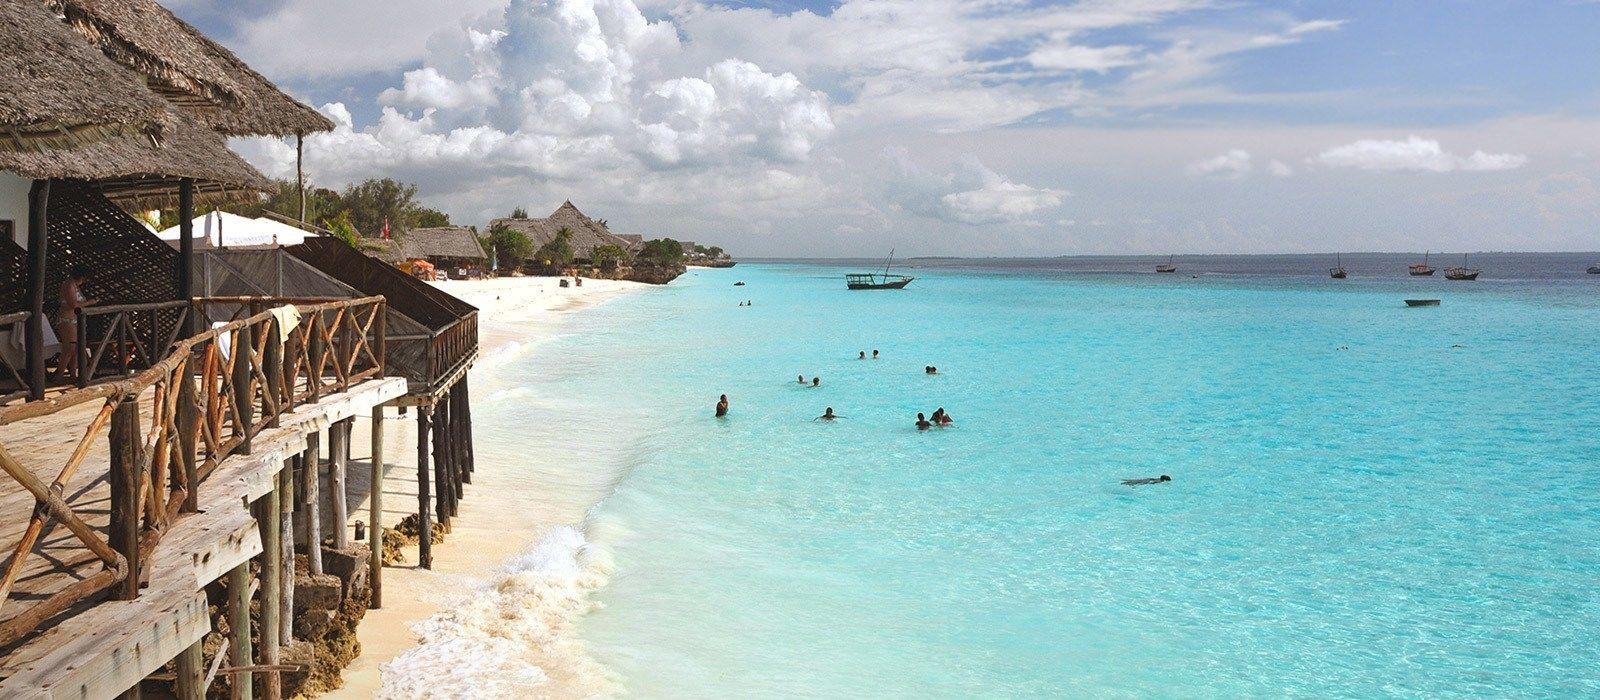 Tansania: Safari Abenteuer & romantisches Sansibar Urlaub 2